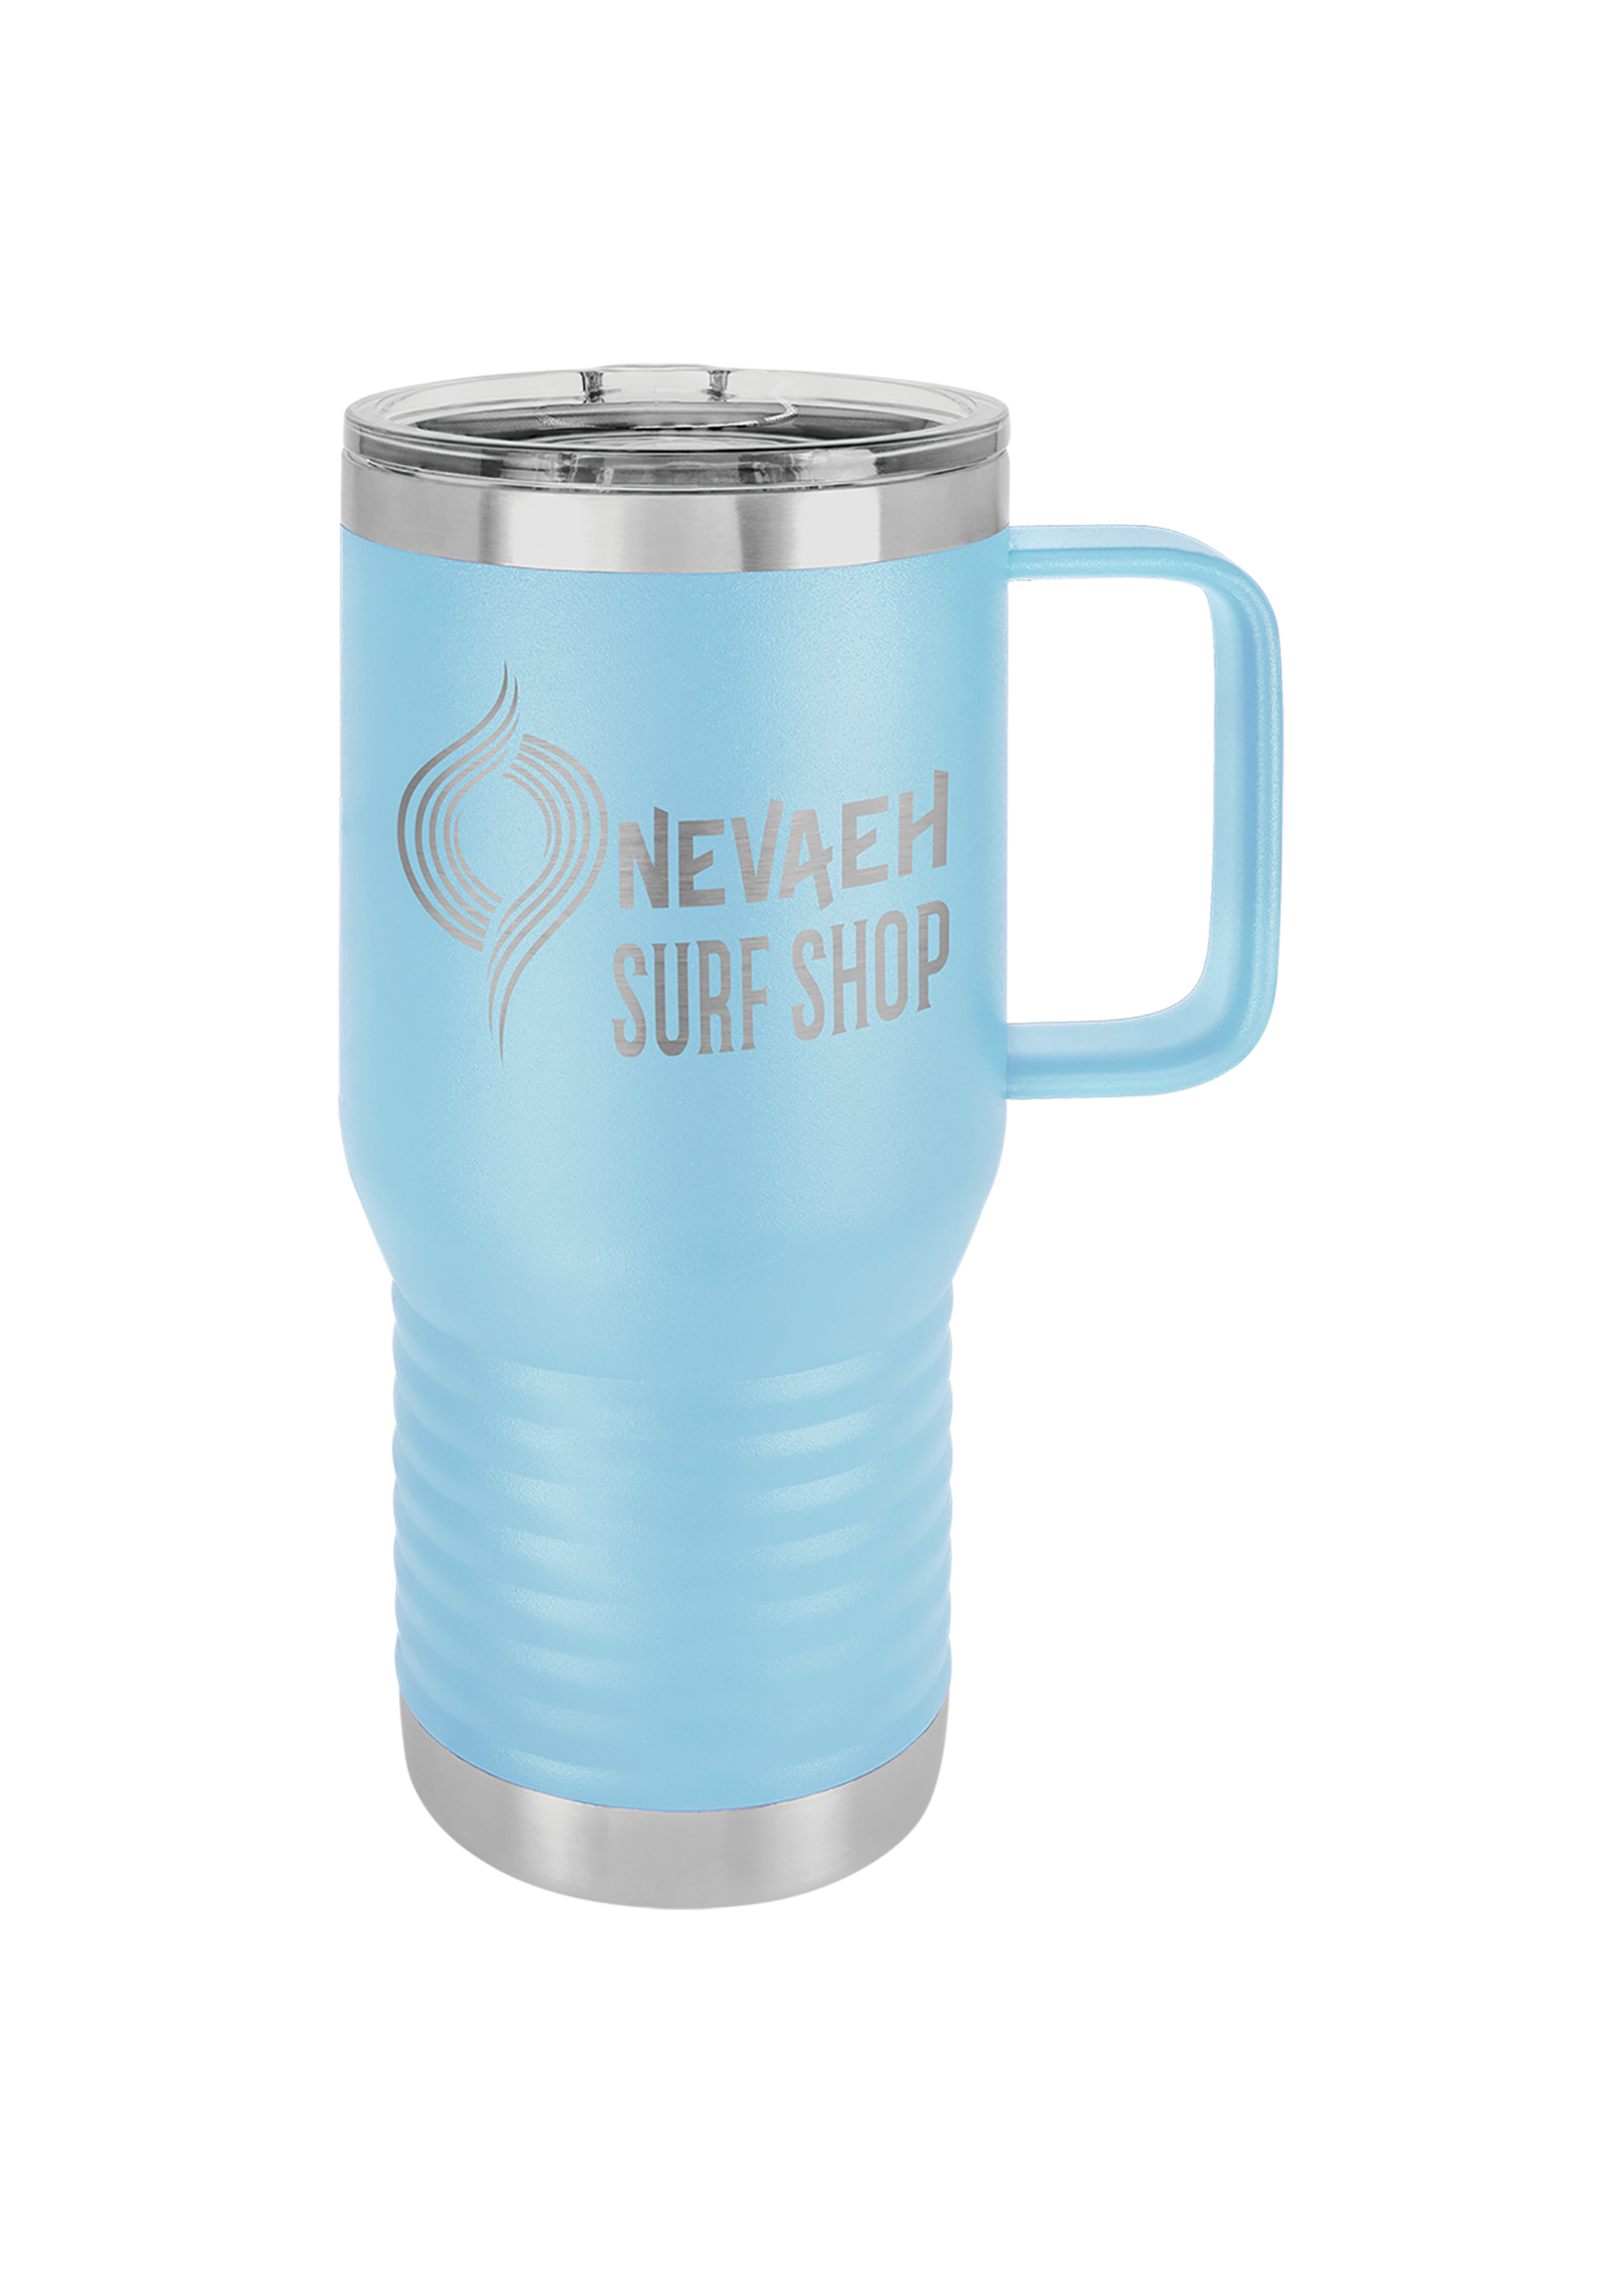 Polar Camel 20 oz Stainless Steel Travel Mug with Slider Lid